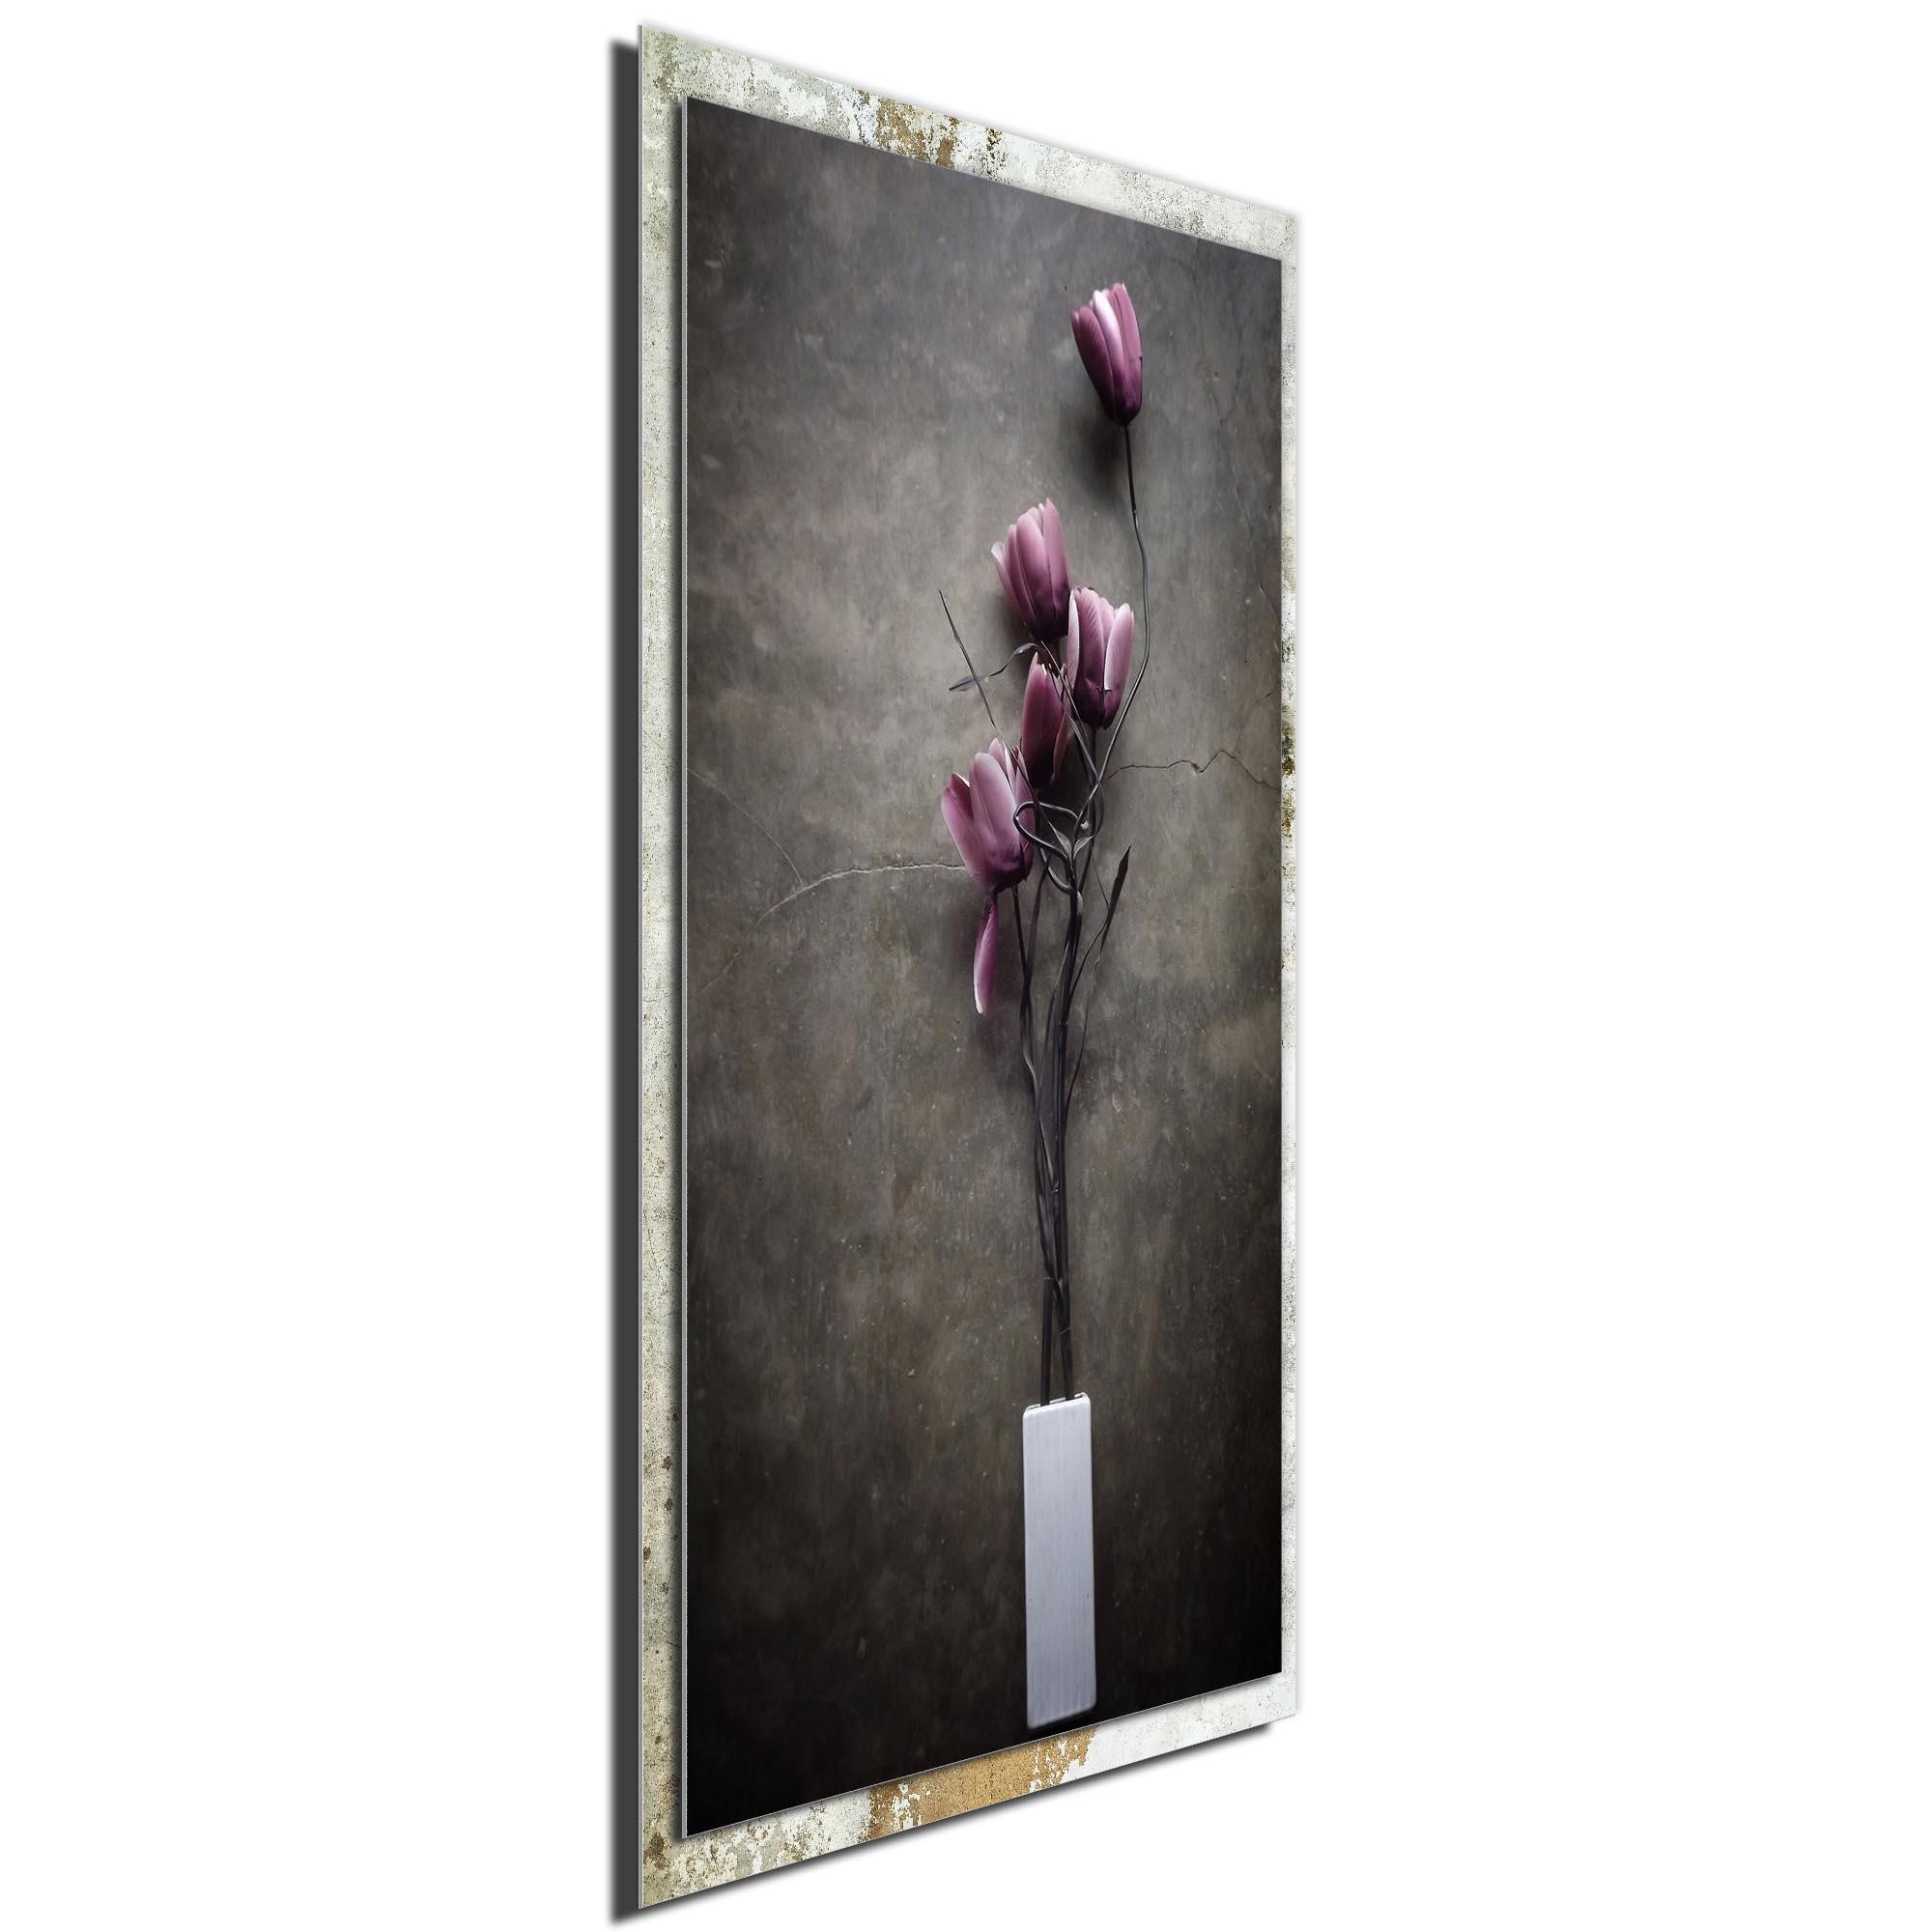 The Purple Tulip by kahar lagaa - Modern Farmhouse Floral on Metal - Image 2